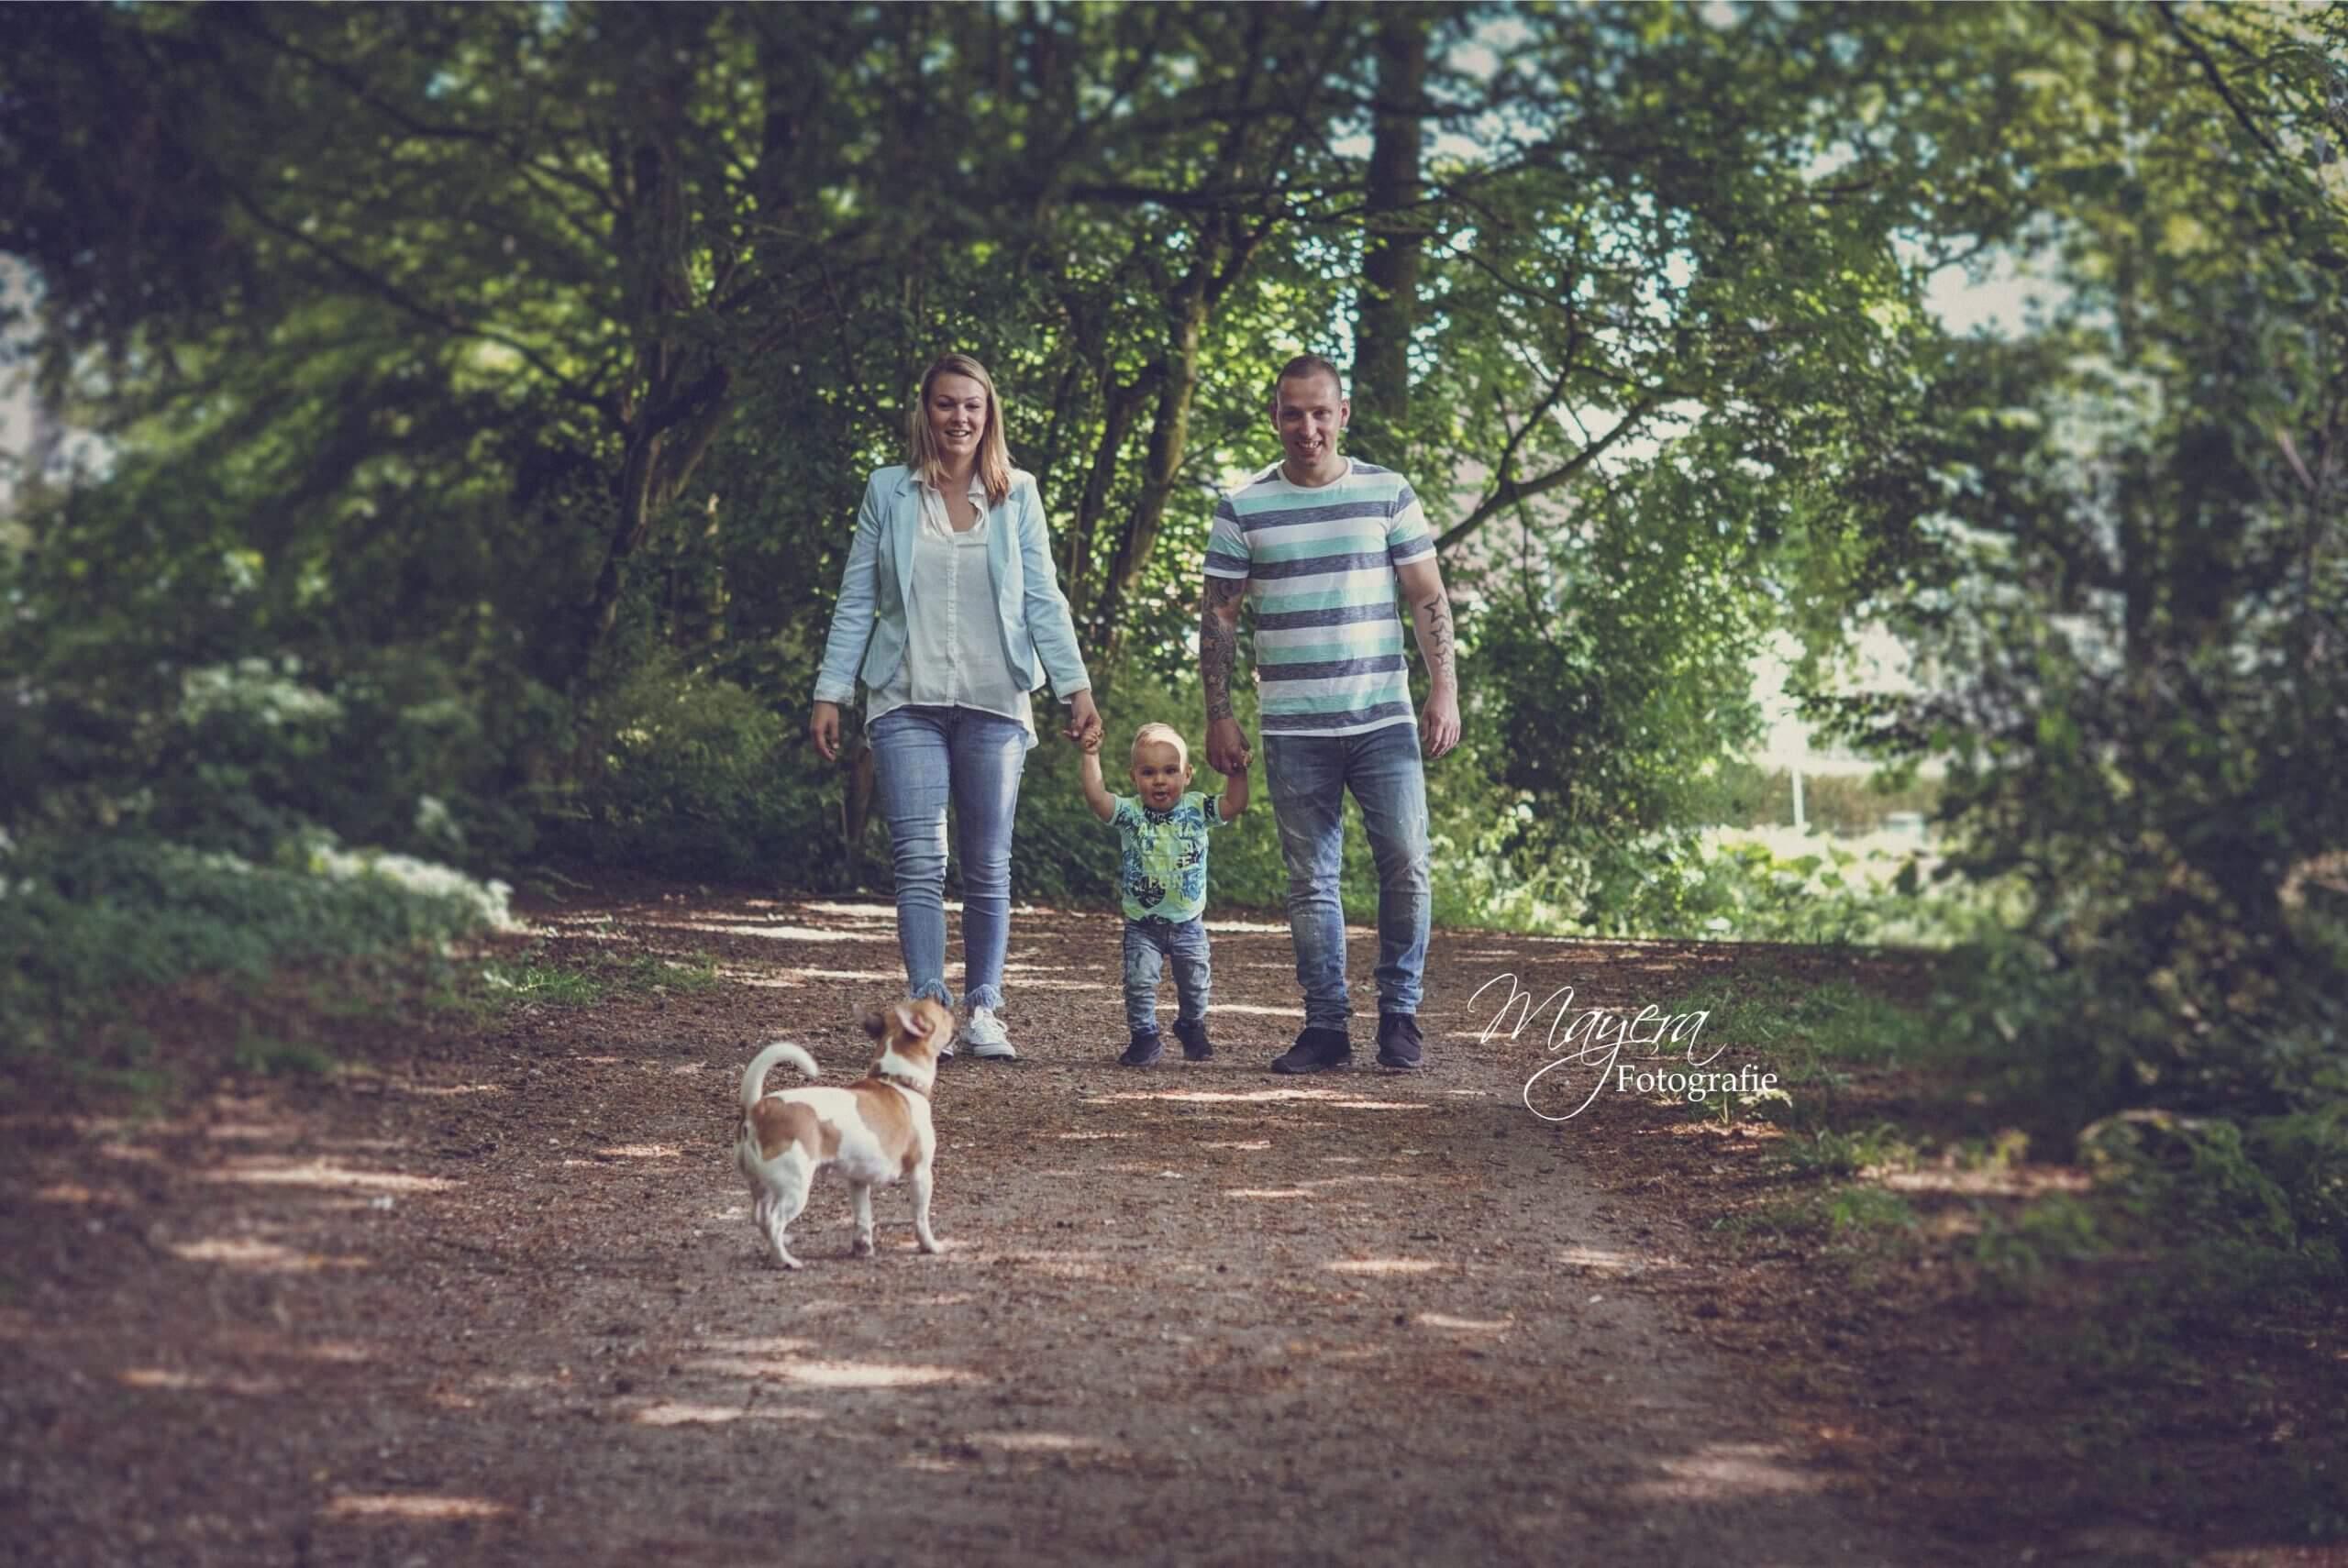 gezinsfoto in het bos